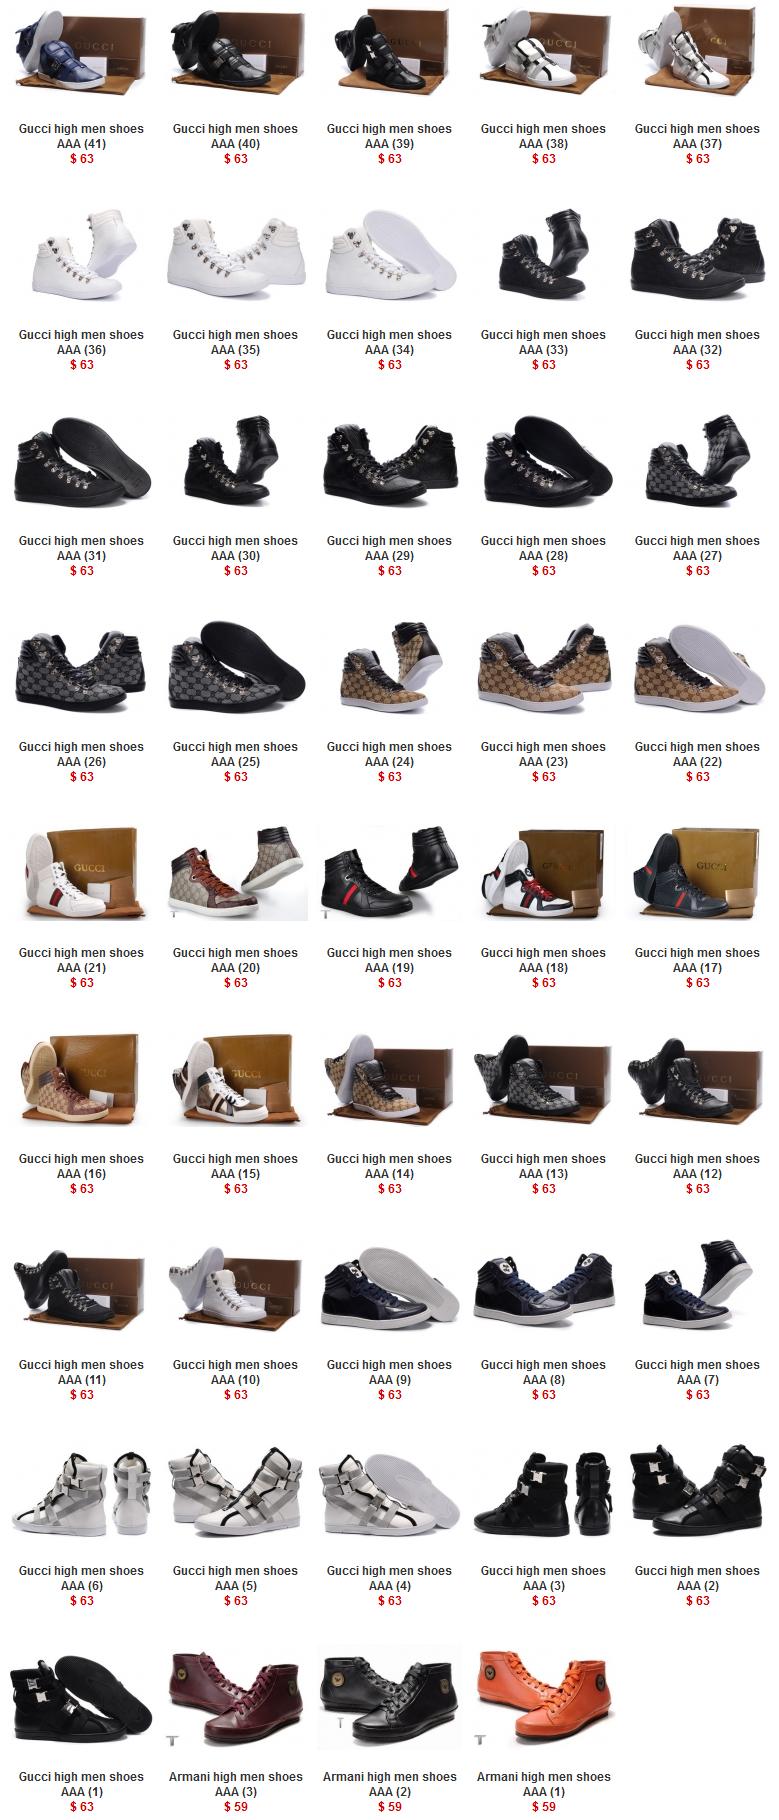 Gucci & Armani high men shoes AAA